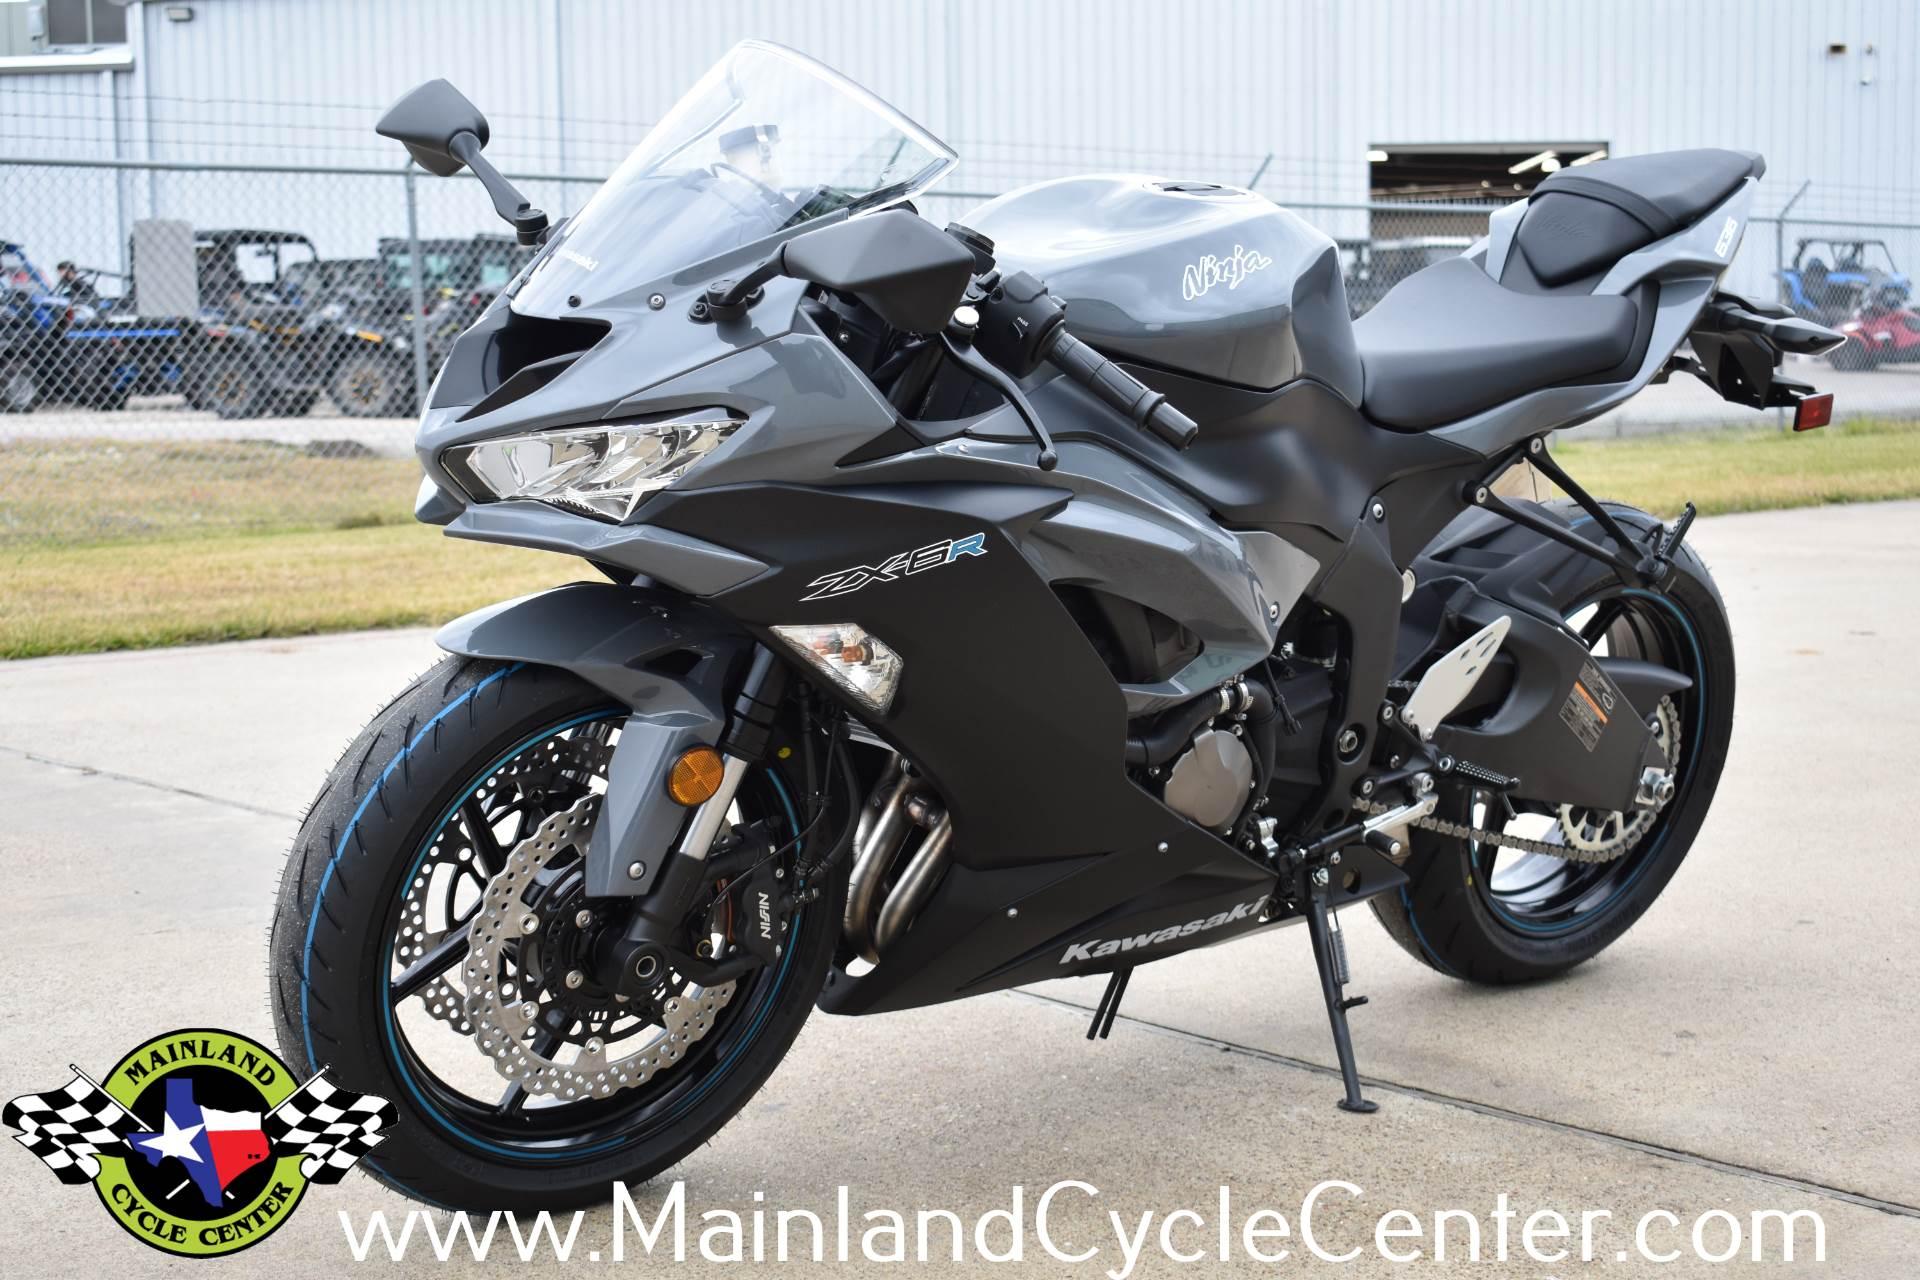 New 2019 Kawasaki Ninja Zx 6r Abs Pearl Storm Gray Metallic Spark